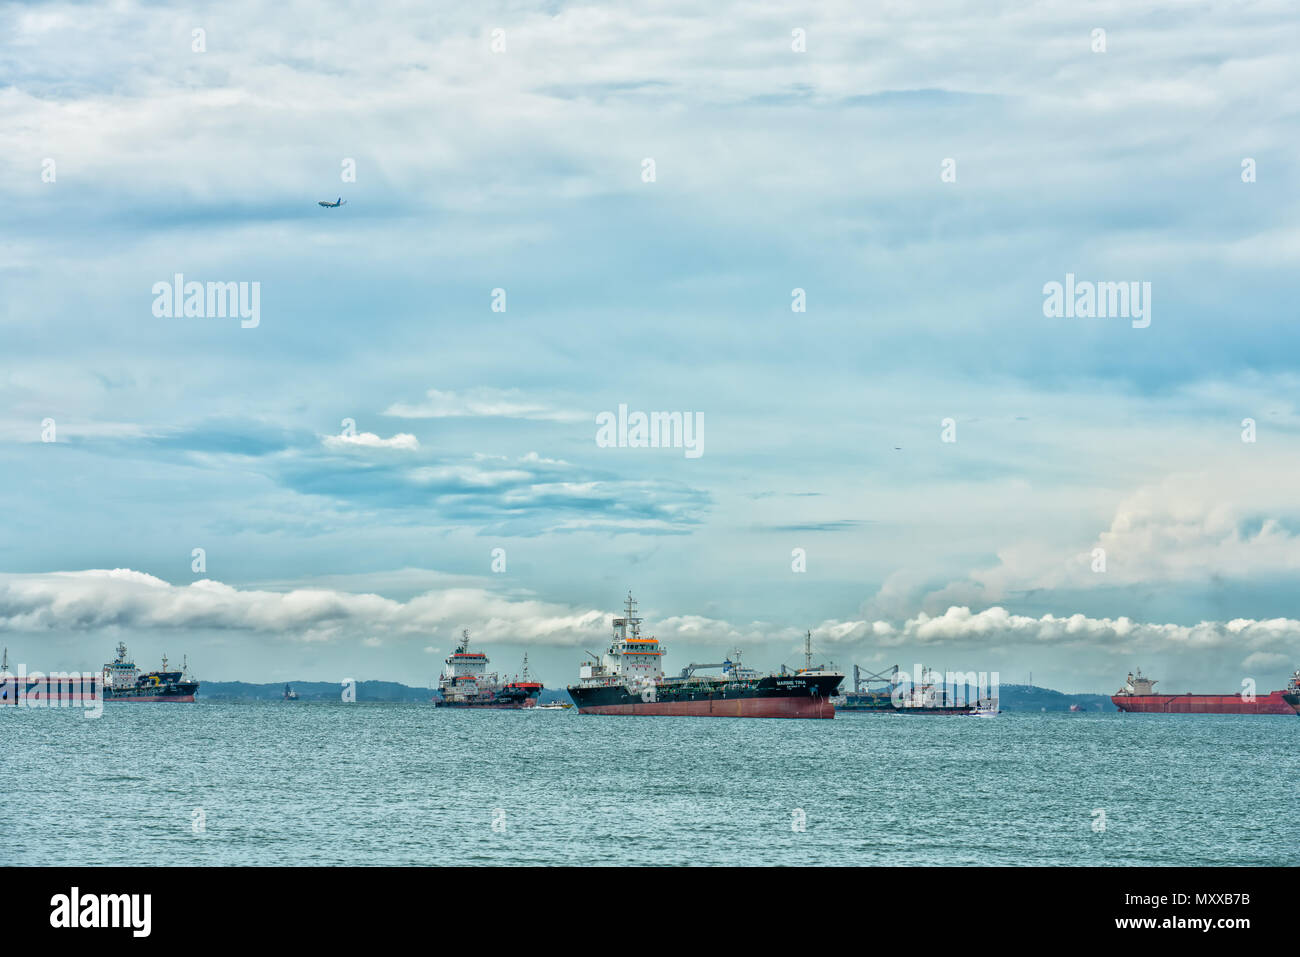 Ships waiting in Singapore Strait - Stock Image